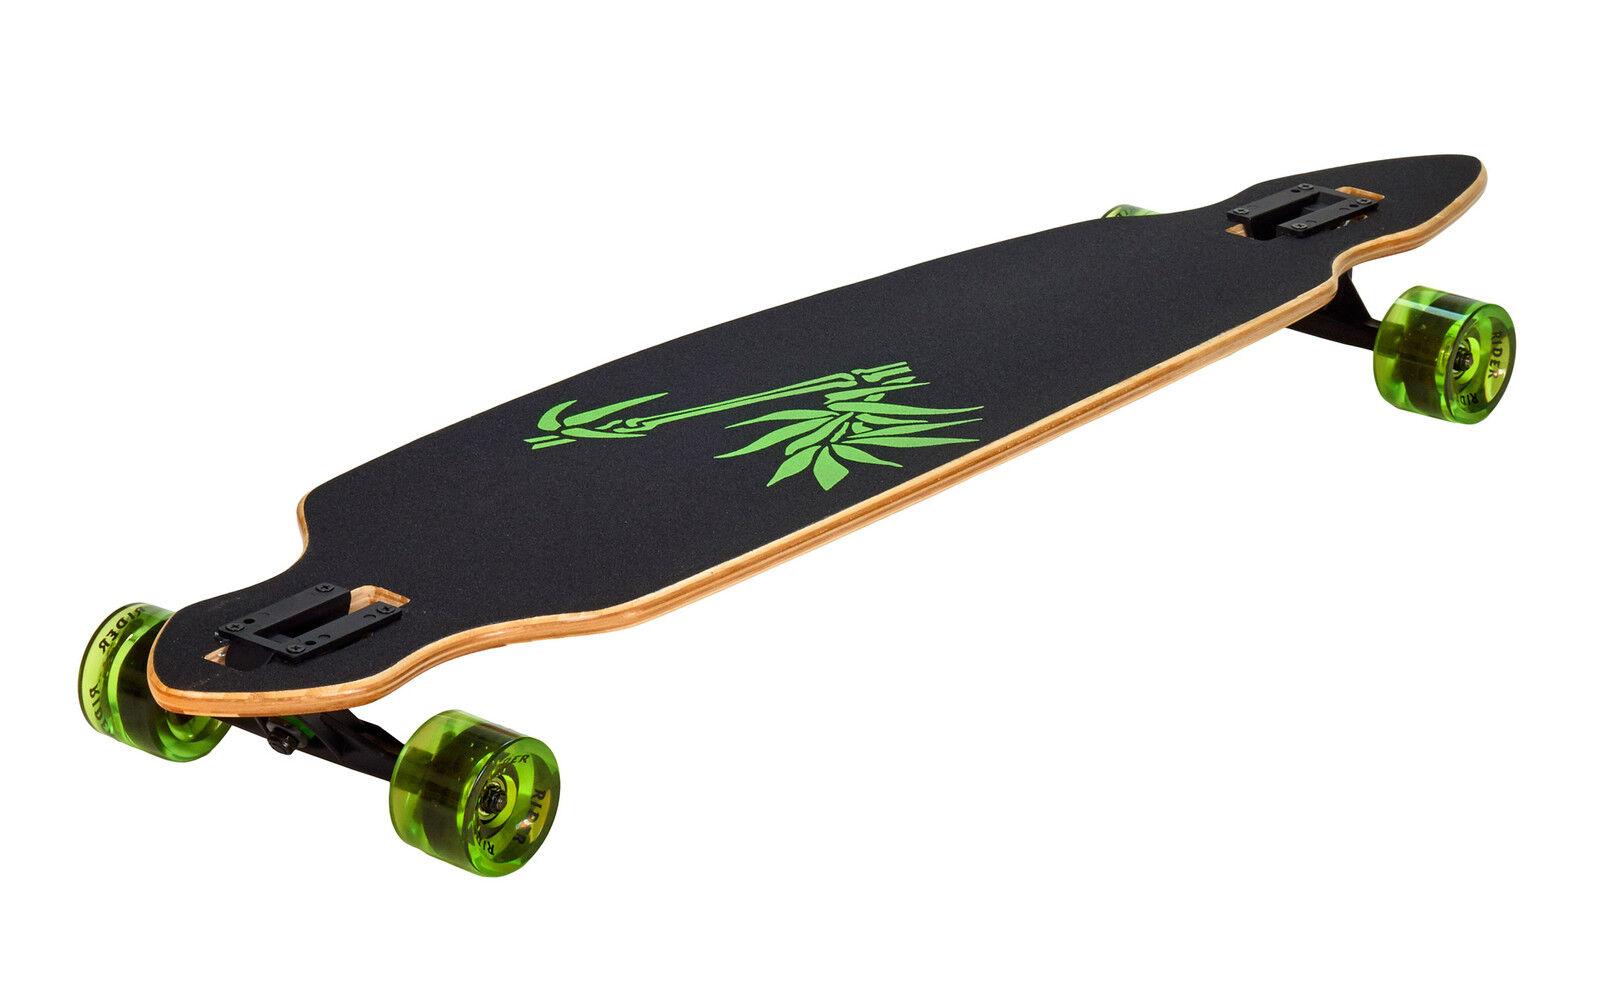 Abverkauf Longboard Komplettboard Bamboo Rider 42 Zoll 106cm Downhill bis 100 Kg